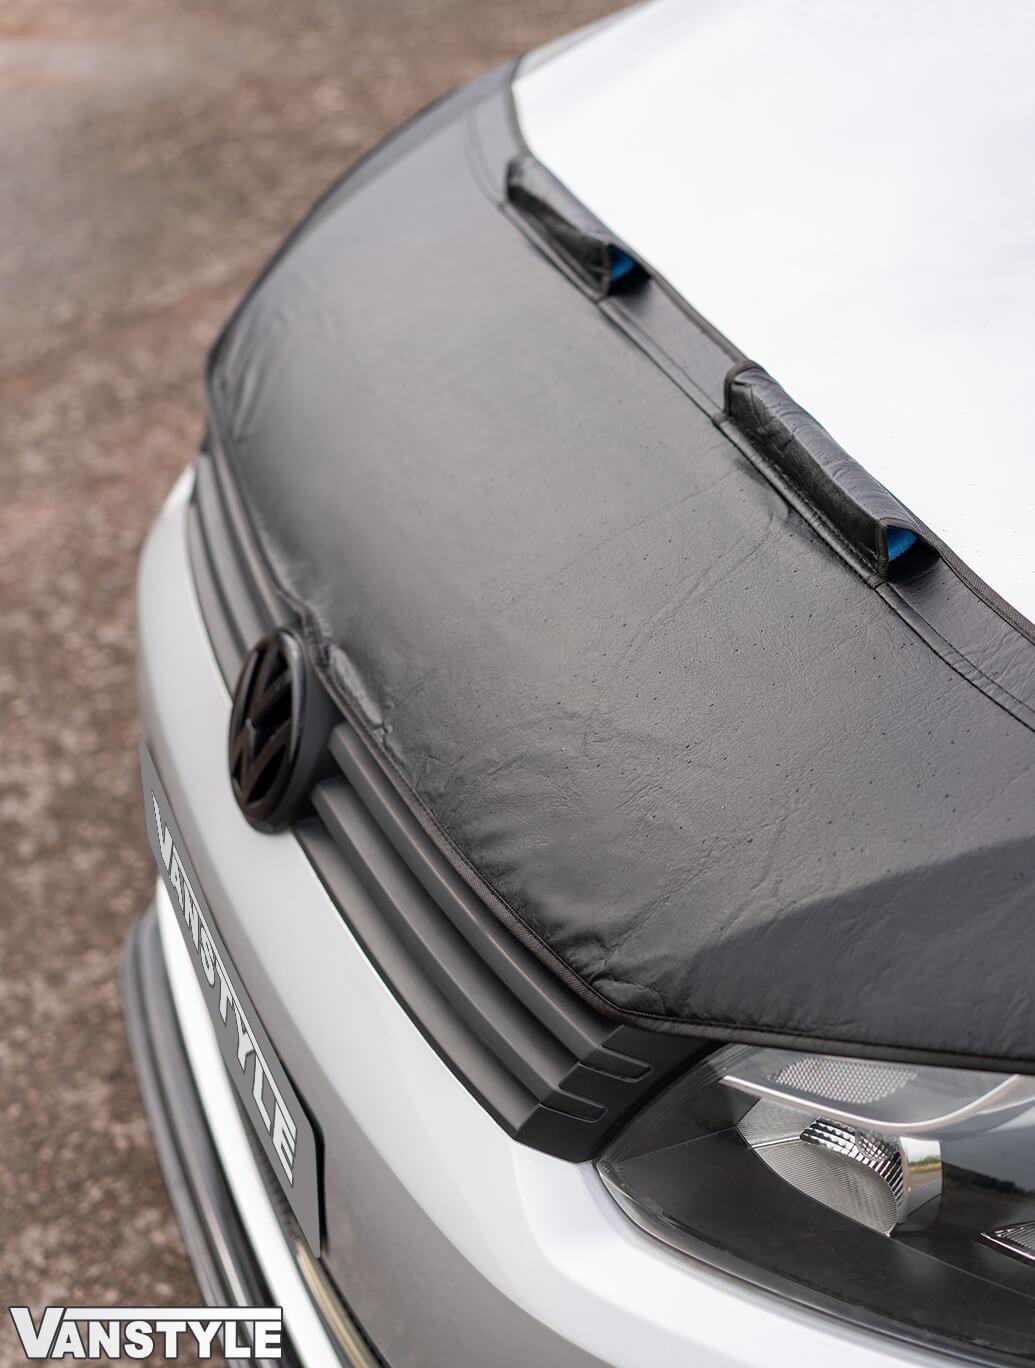 VW Caddy Half Aero Bonnet Bra 2010-15